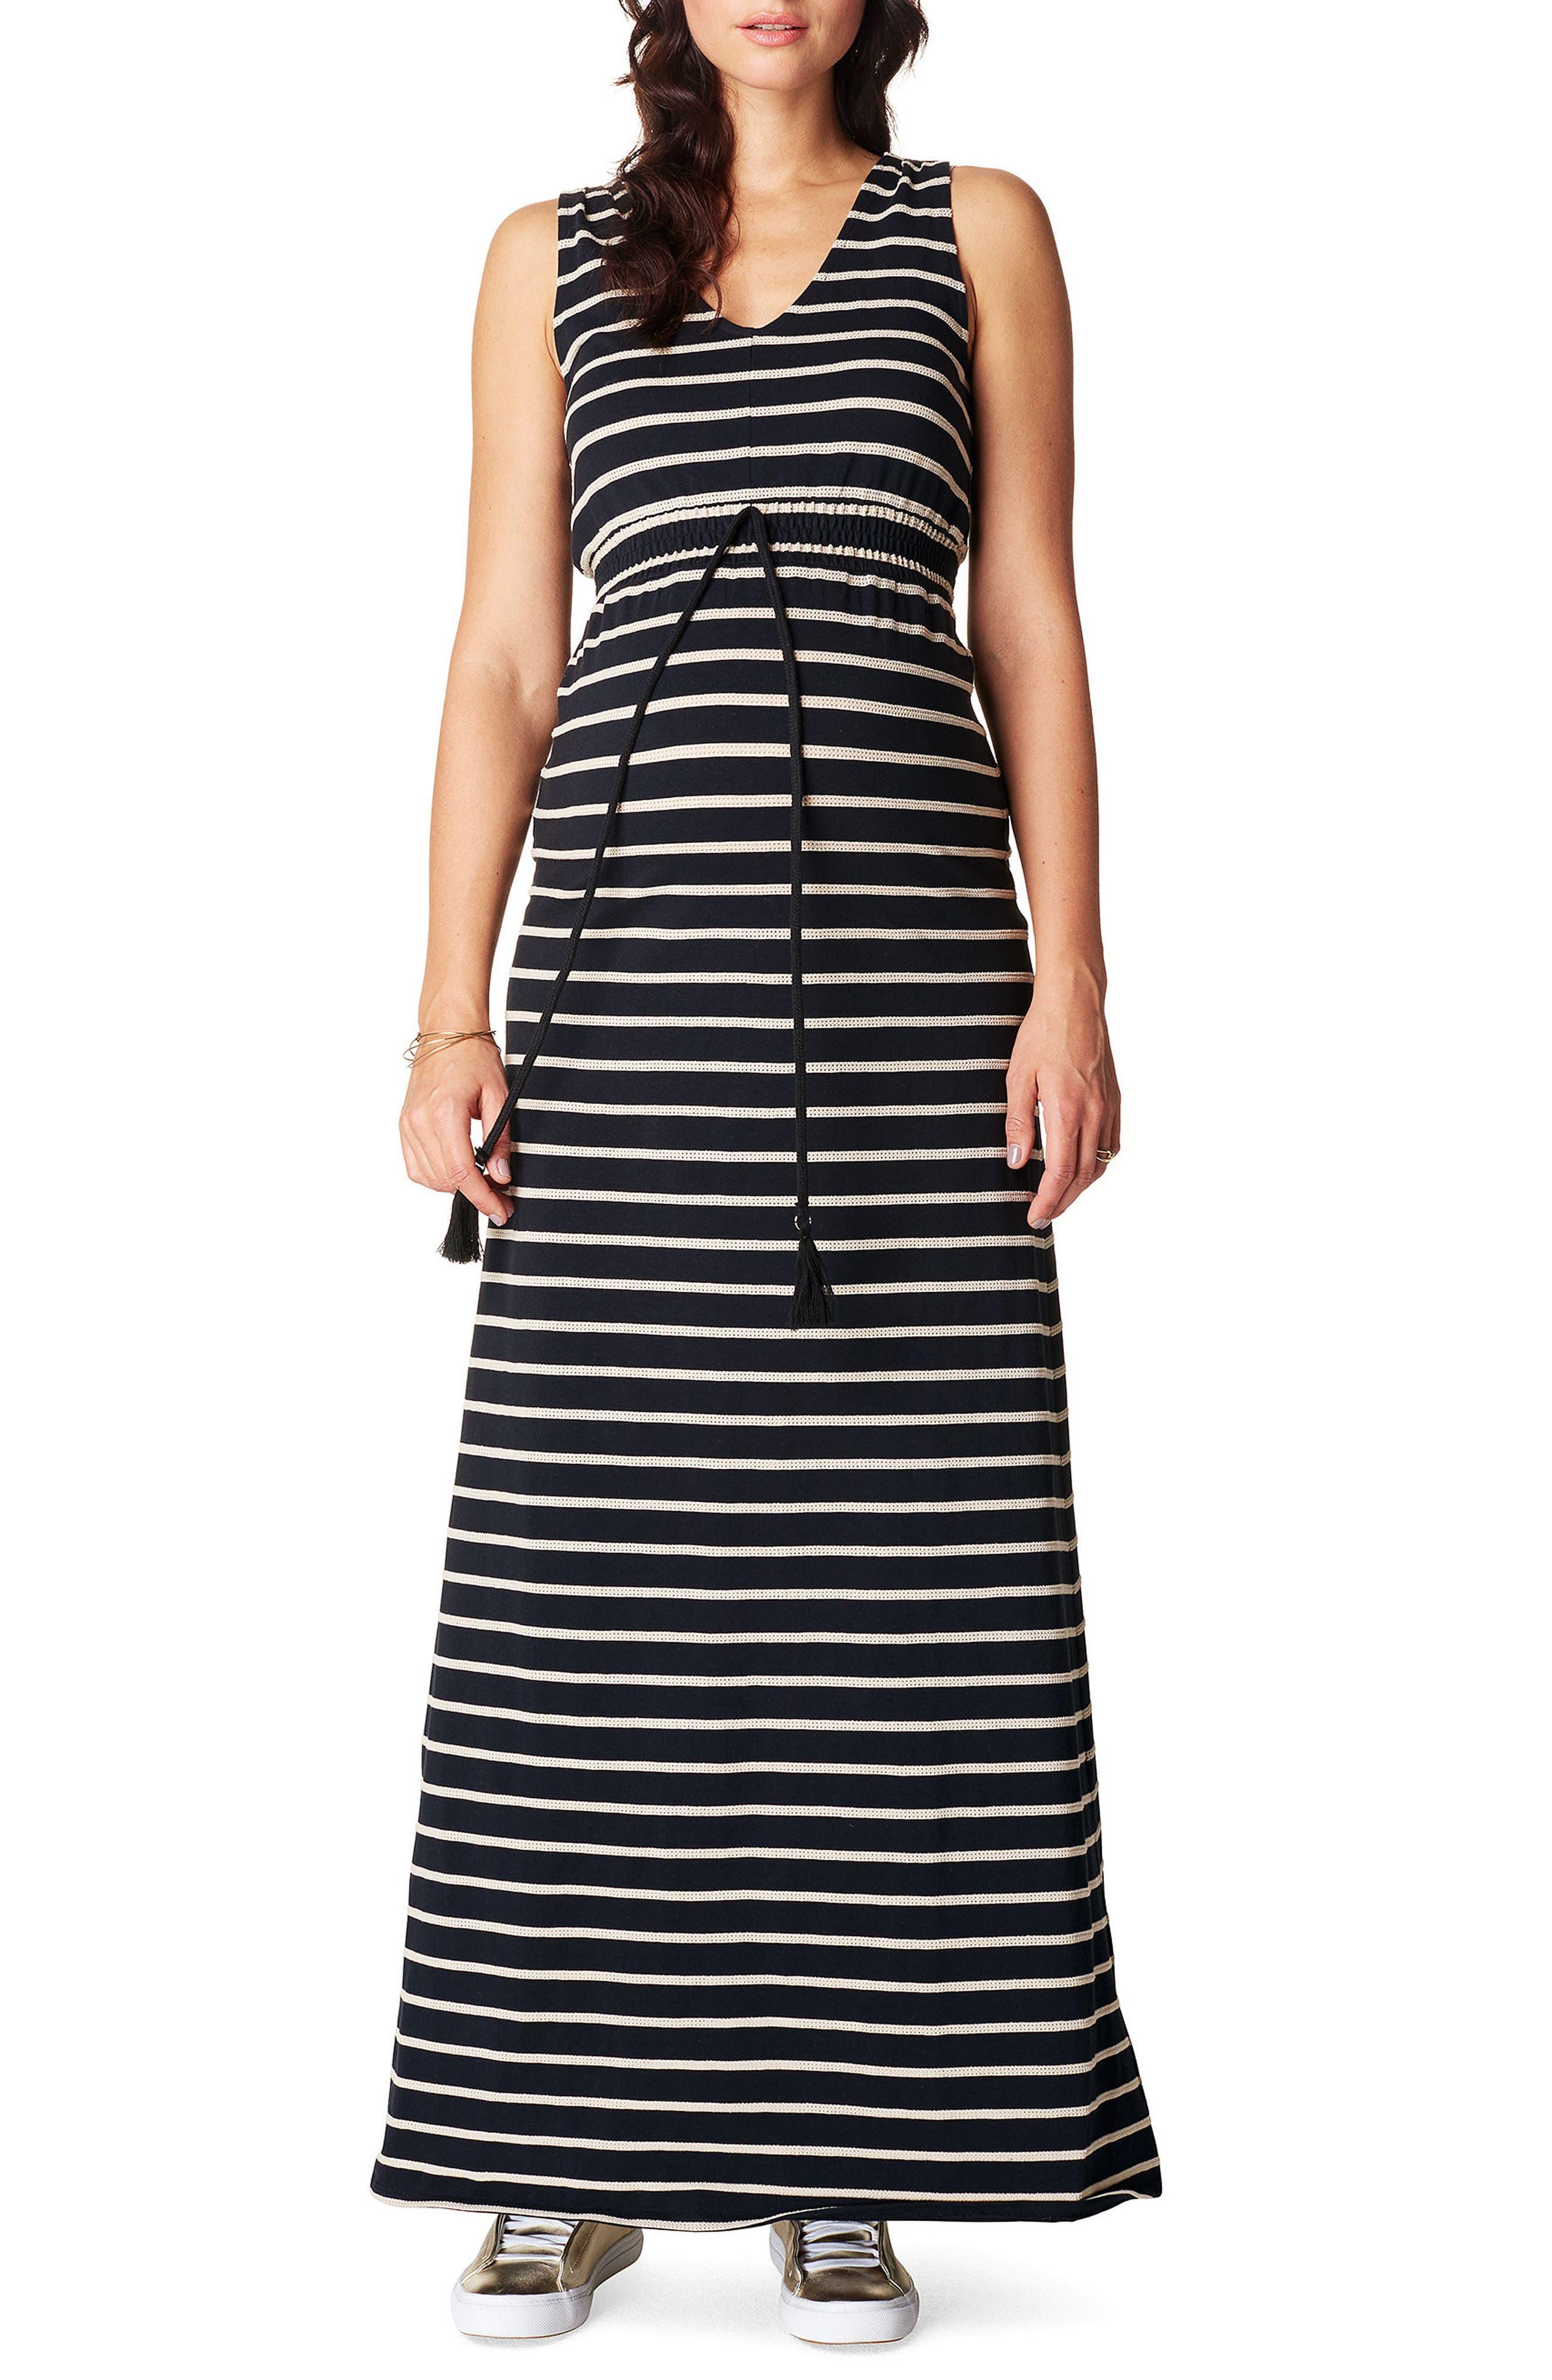 Mila Maternity Maxi Dress,                         Main,                         color, BLACK